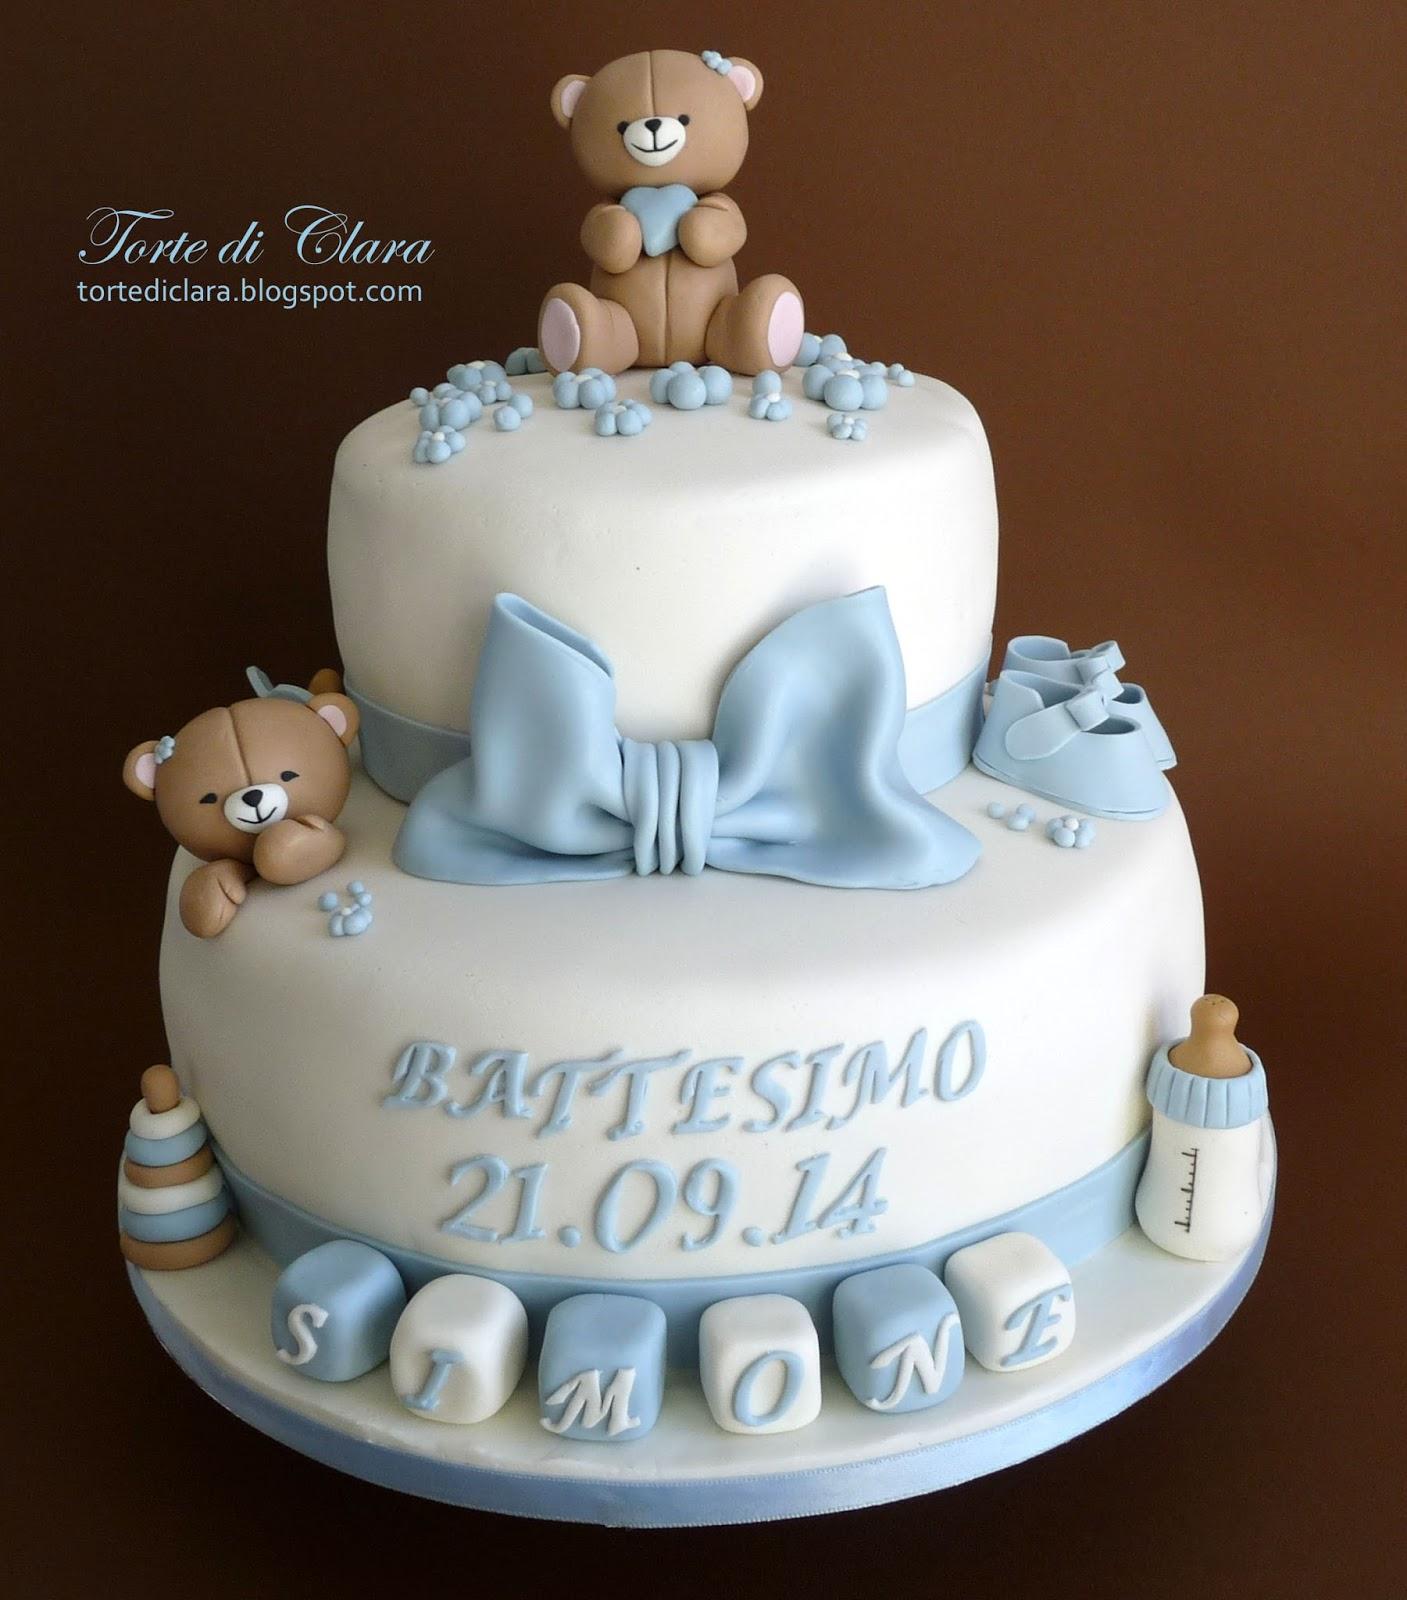 Conosciuto Torte di Clara: Torta Battesimo (6) YL72